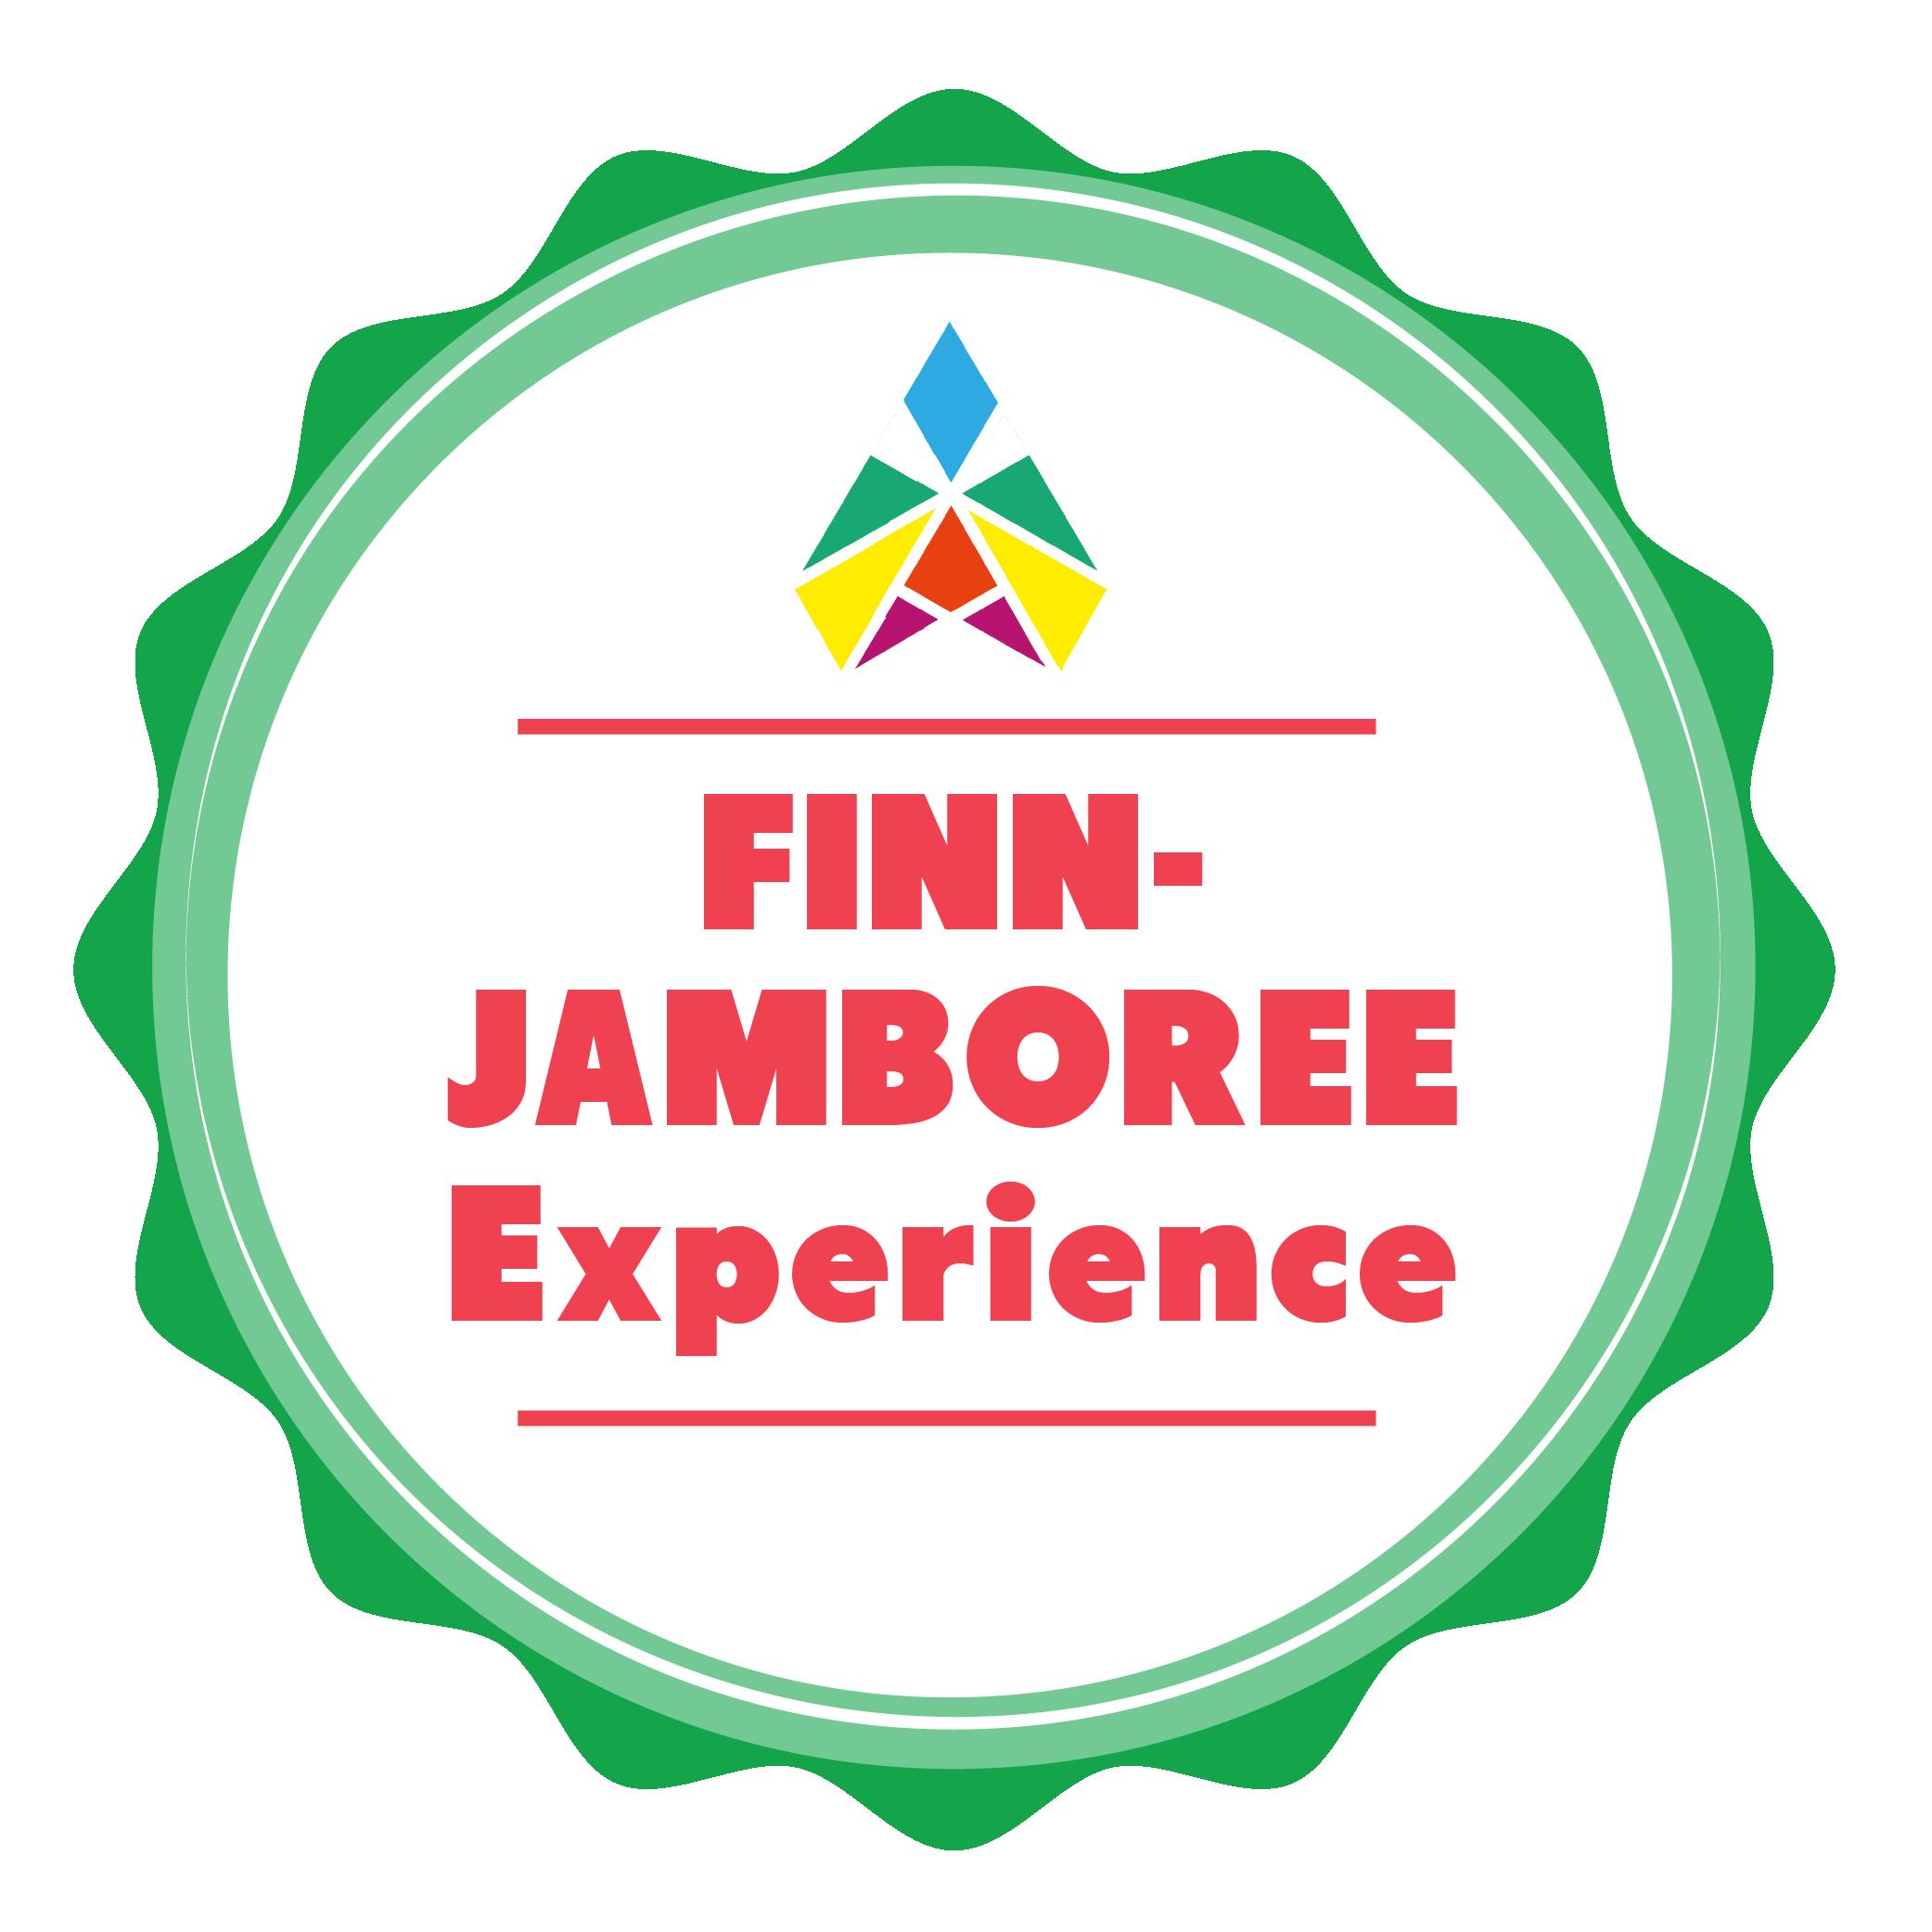 Finnjamboree Experience